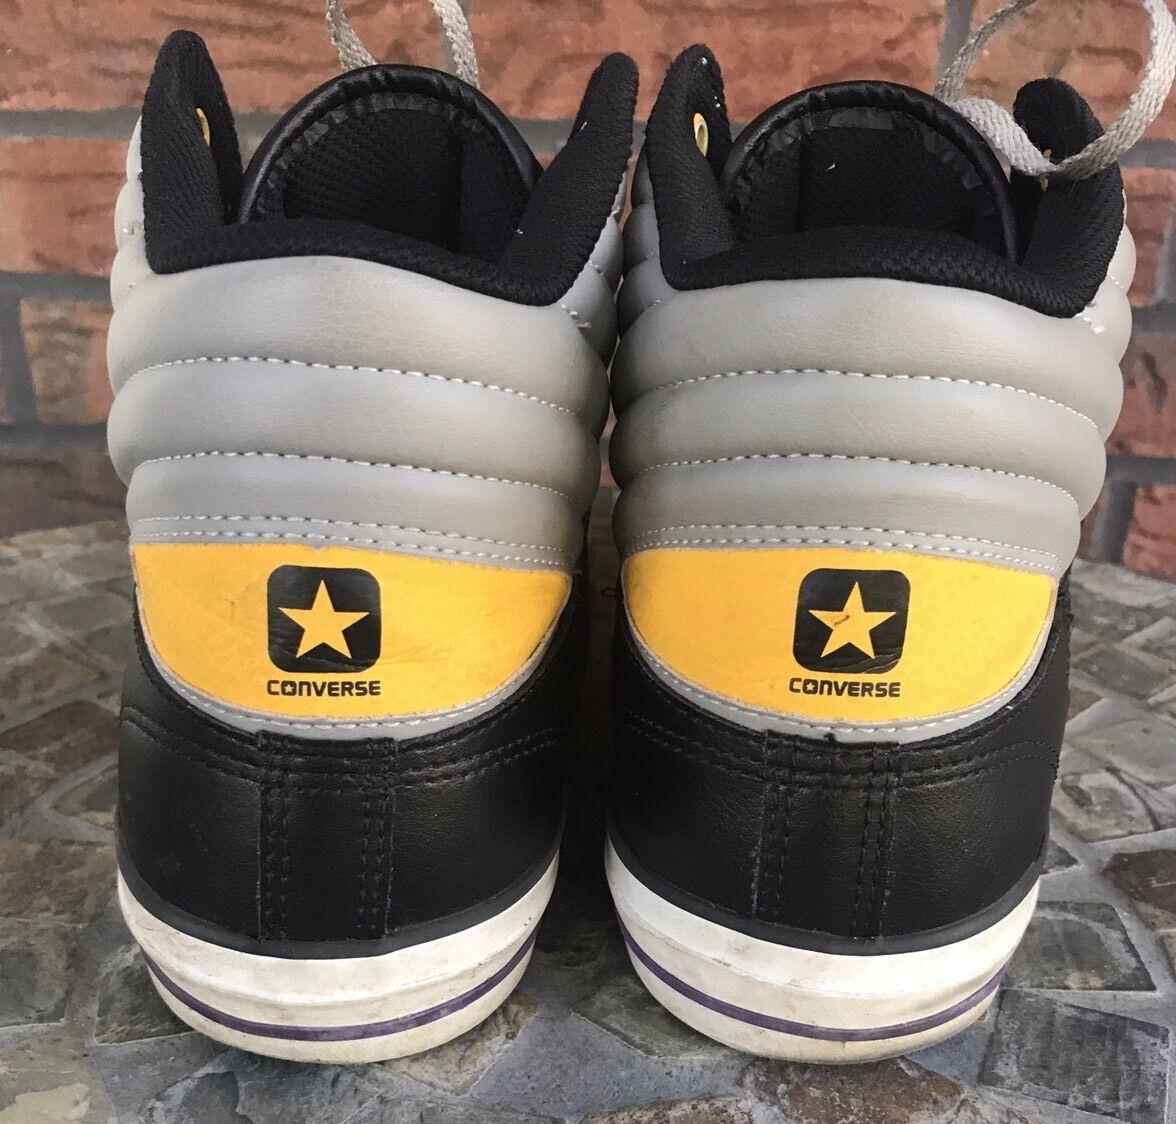 Cons Converse Men Sz 10 Women Sz 12 High Top Shoes Black Gray Yellow Tennis Shoe image 4